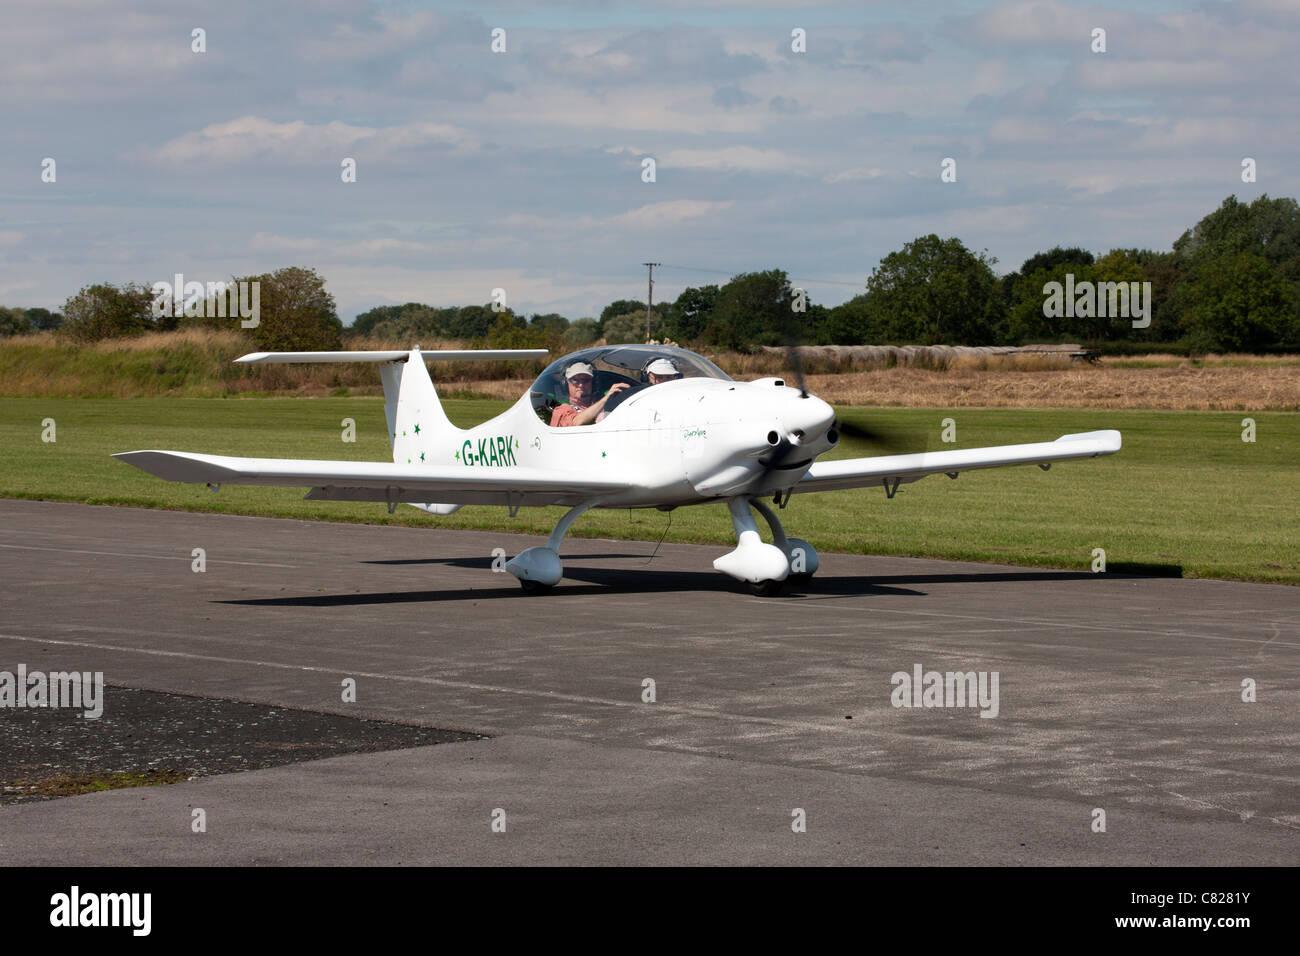 DynAero MCR-01 Club G-KARK taxiing at Breighton Airfield - Stock Image